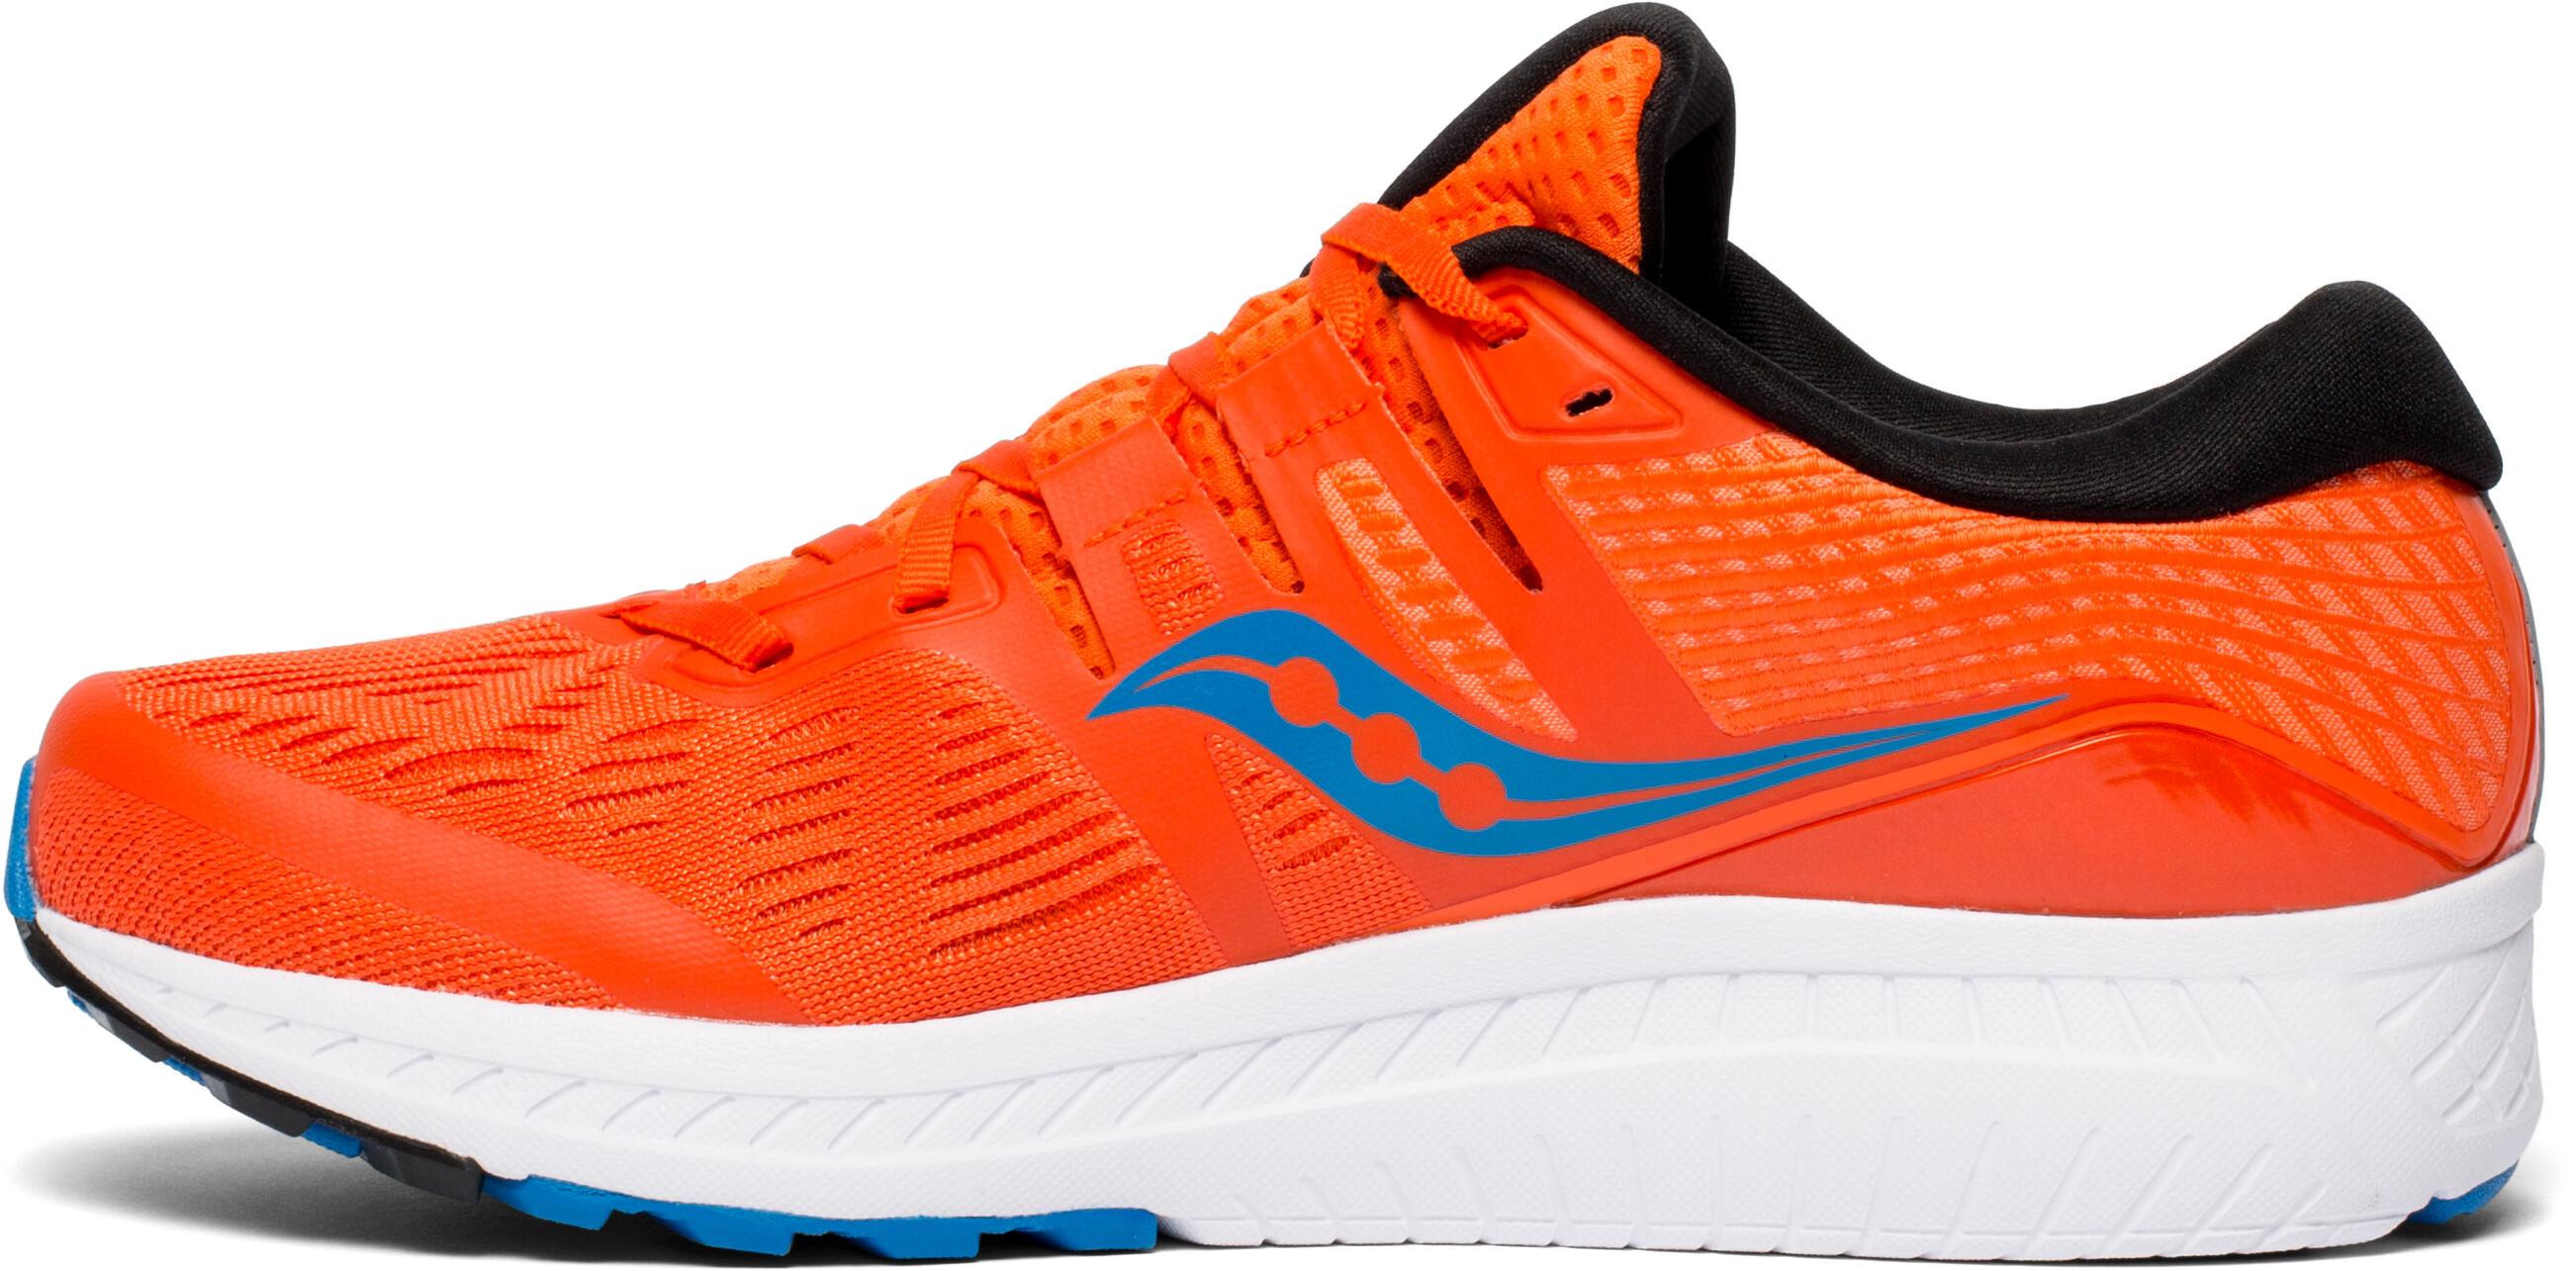 c0d107d1e0b saucony Ride ISO - Chaussures running Homme - orange sur CAMPZ !